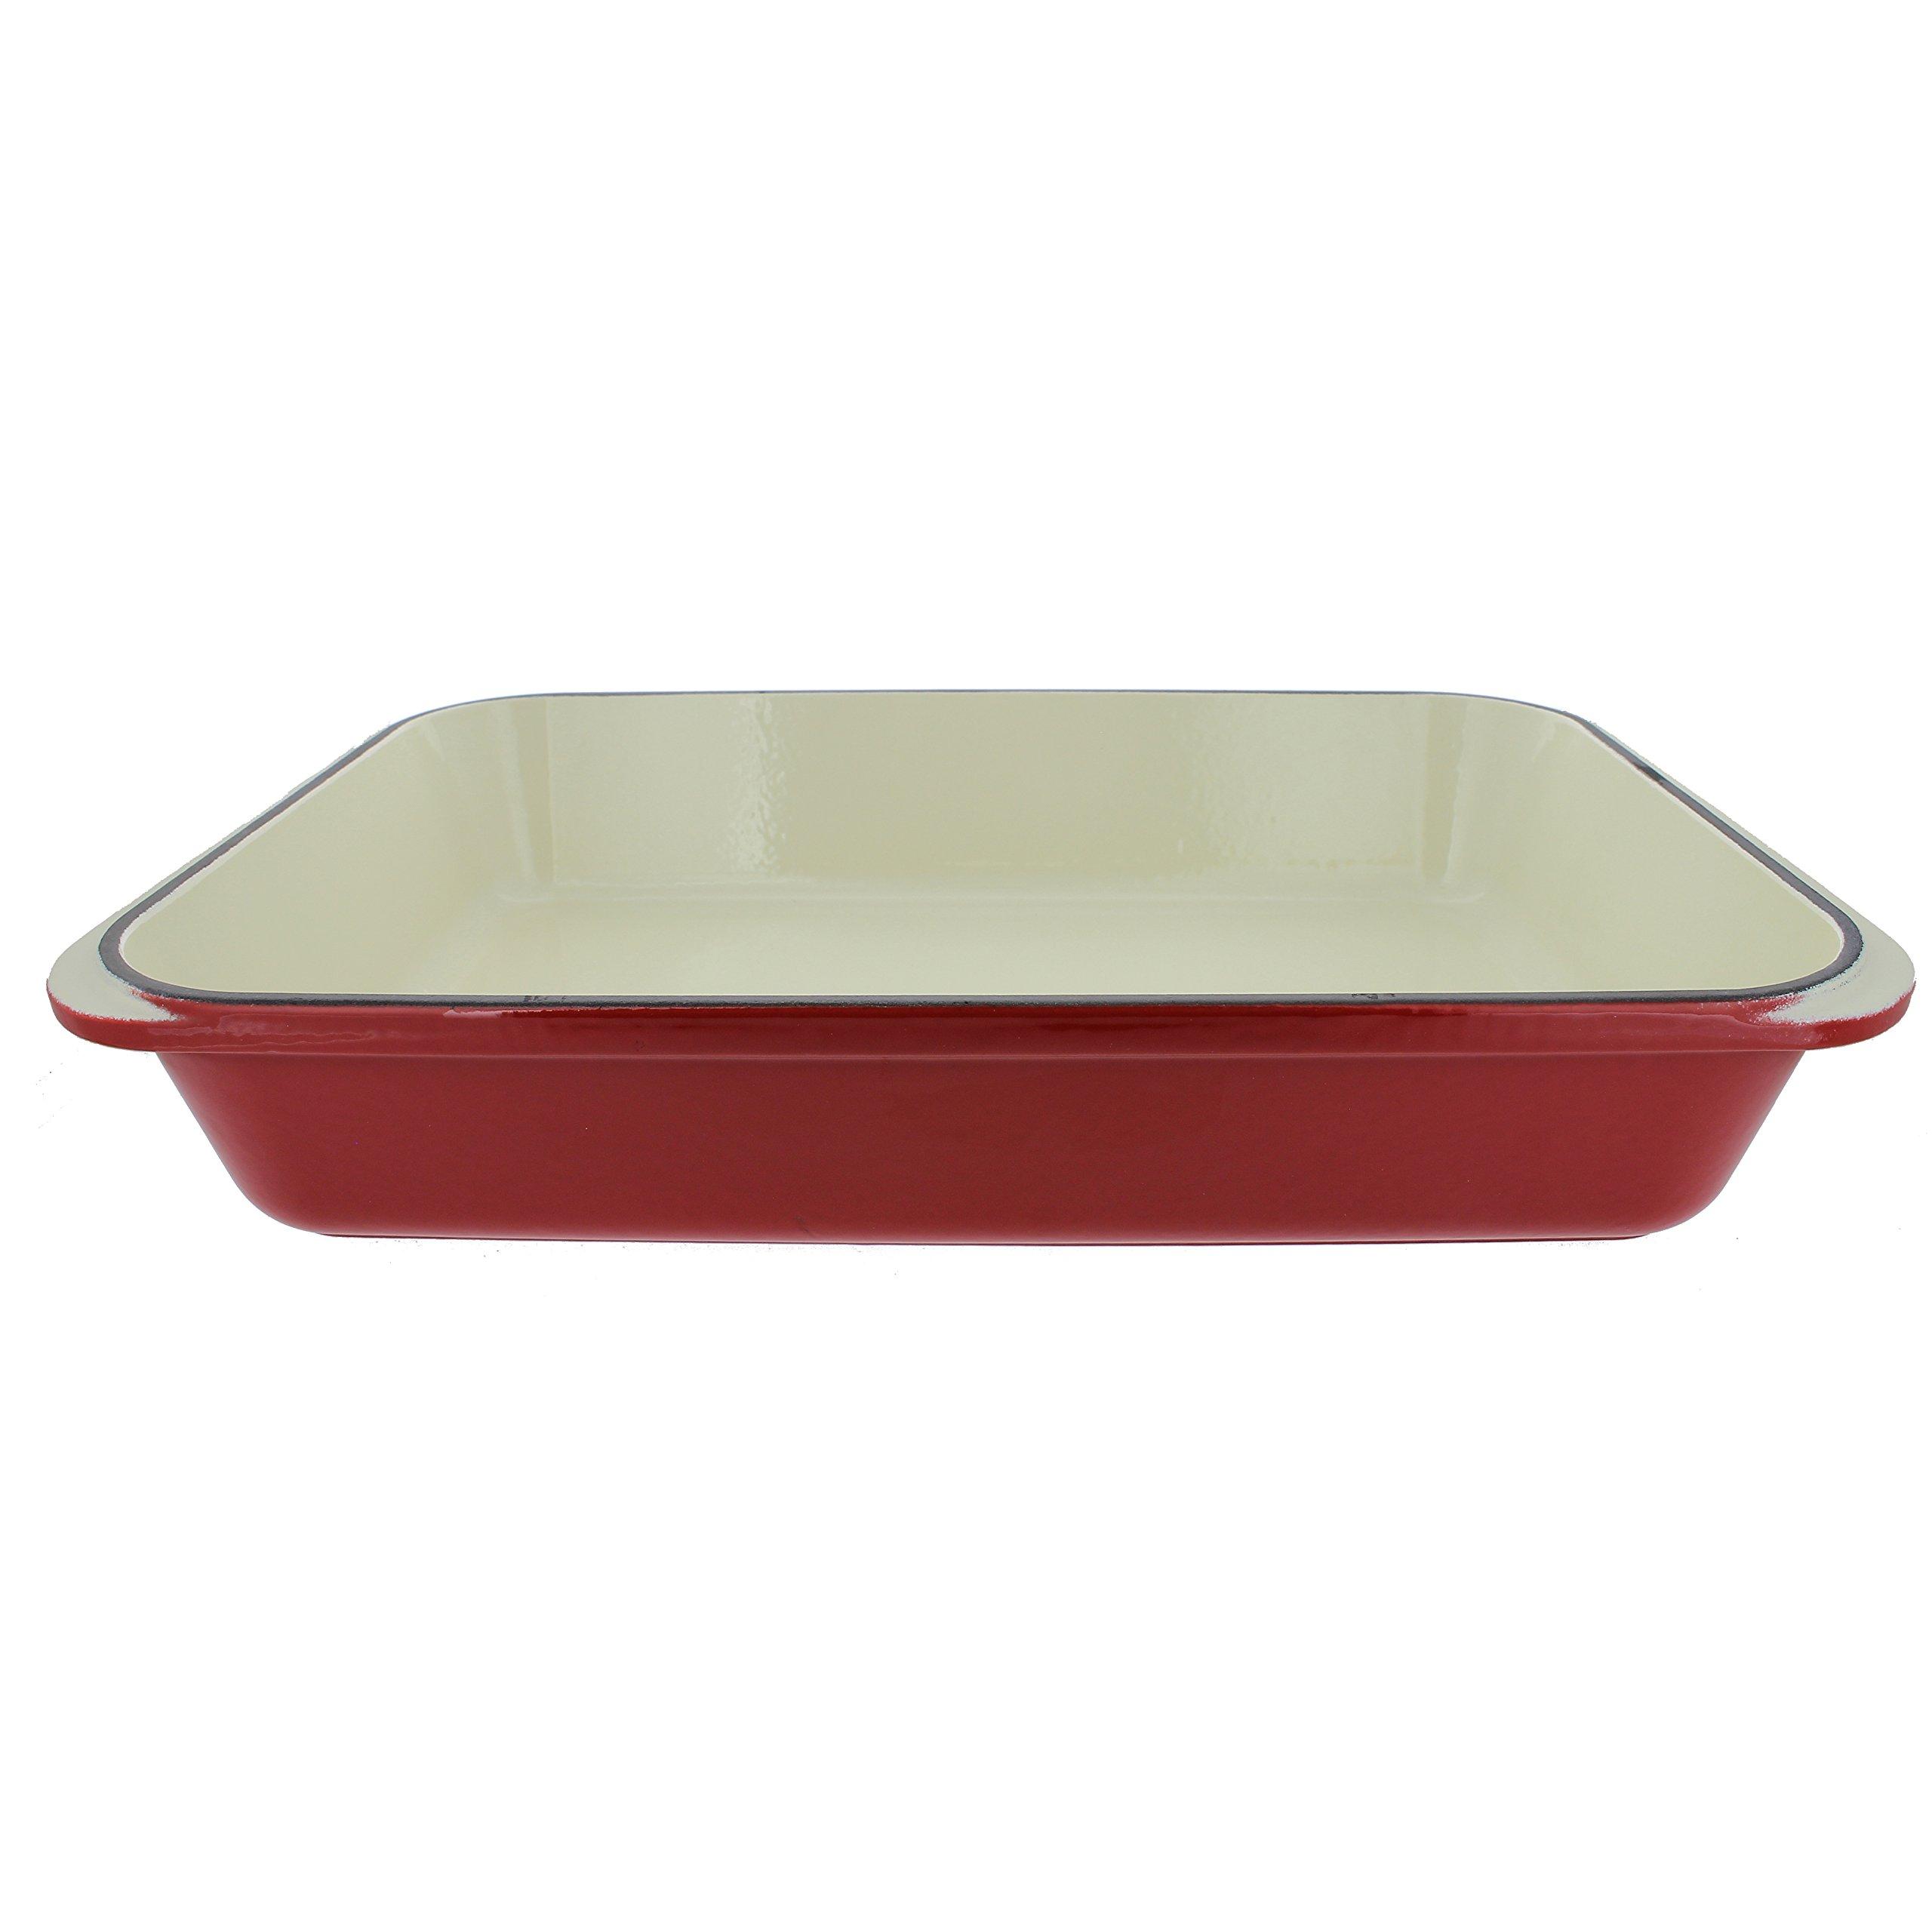 Chasseur 4.25-quart Red French Enameled Cast Iron Rectangular Roaster